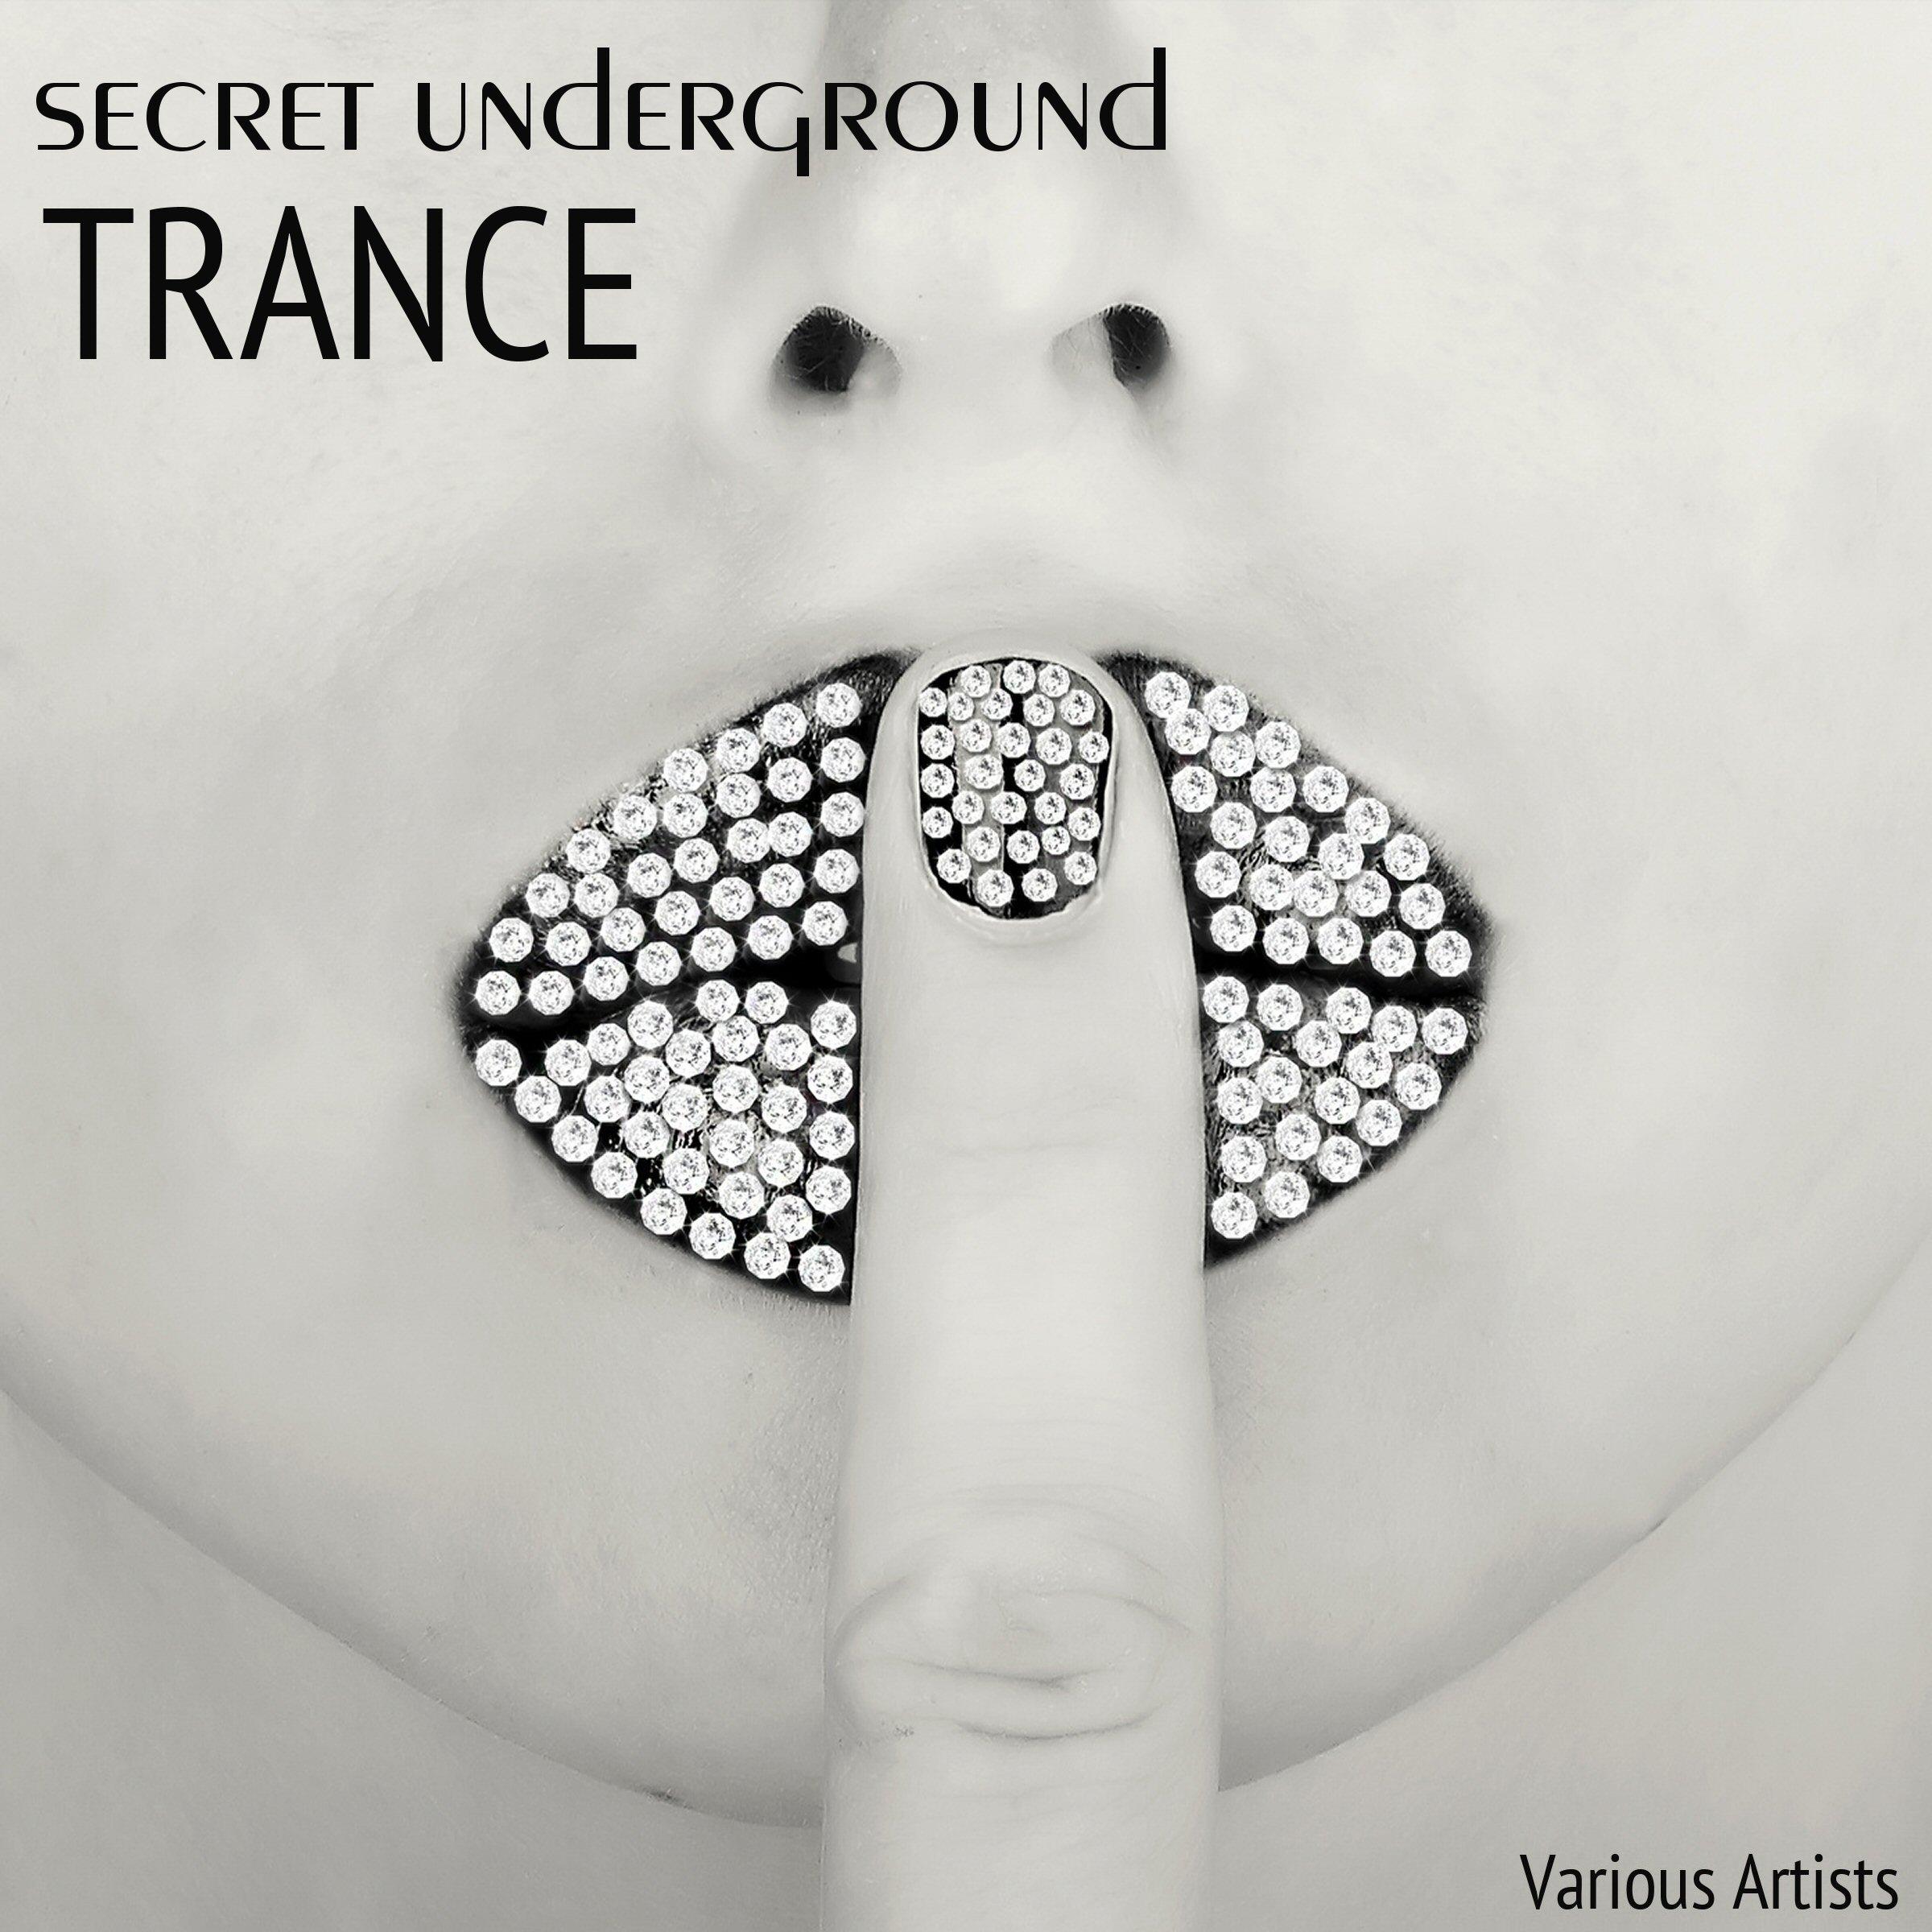 secret underground trance